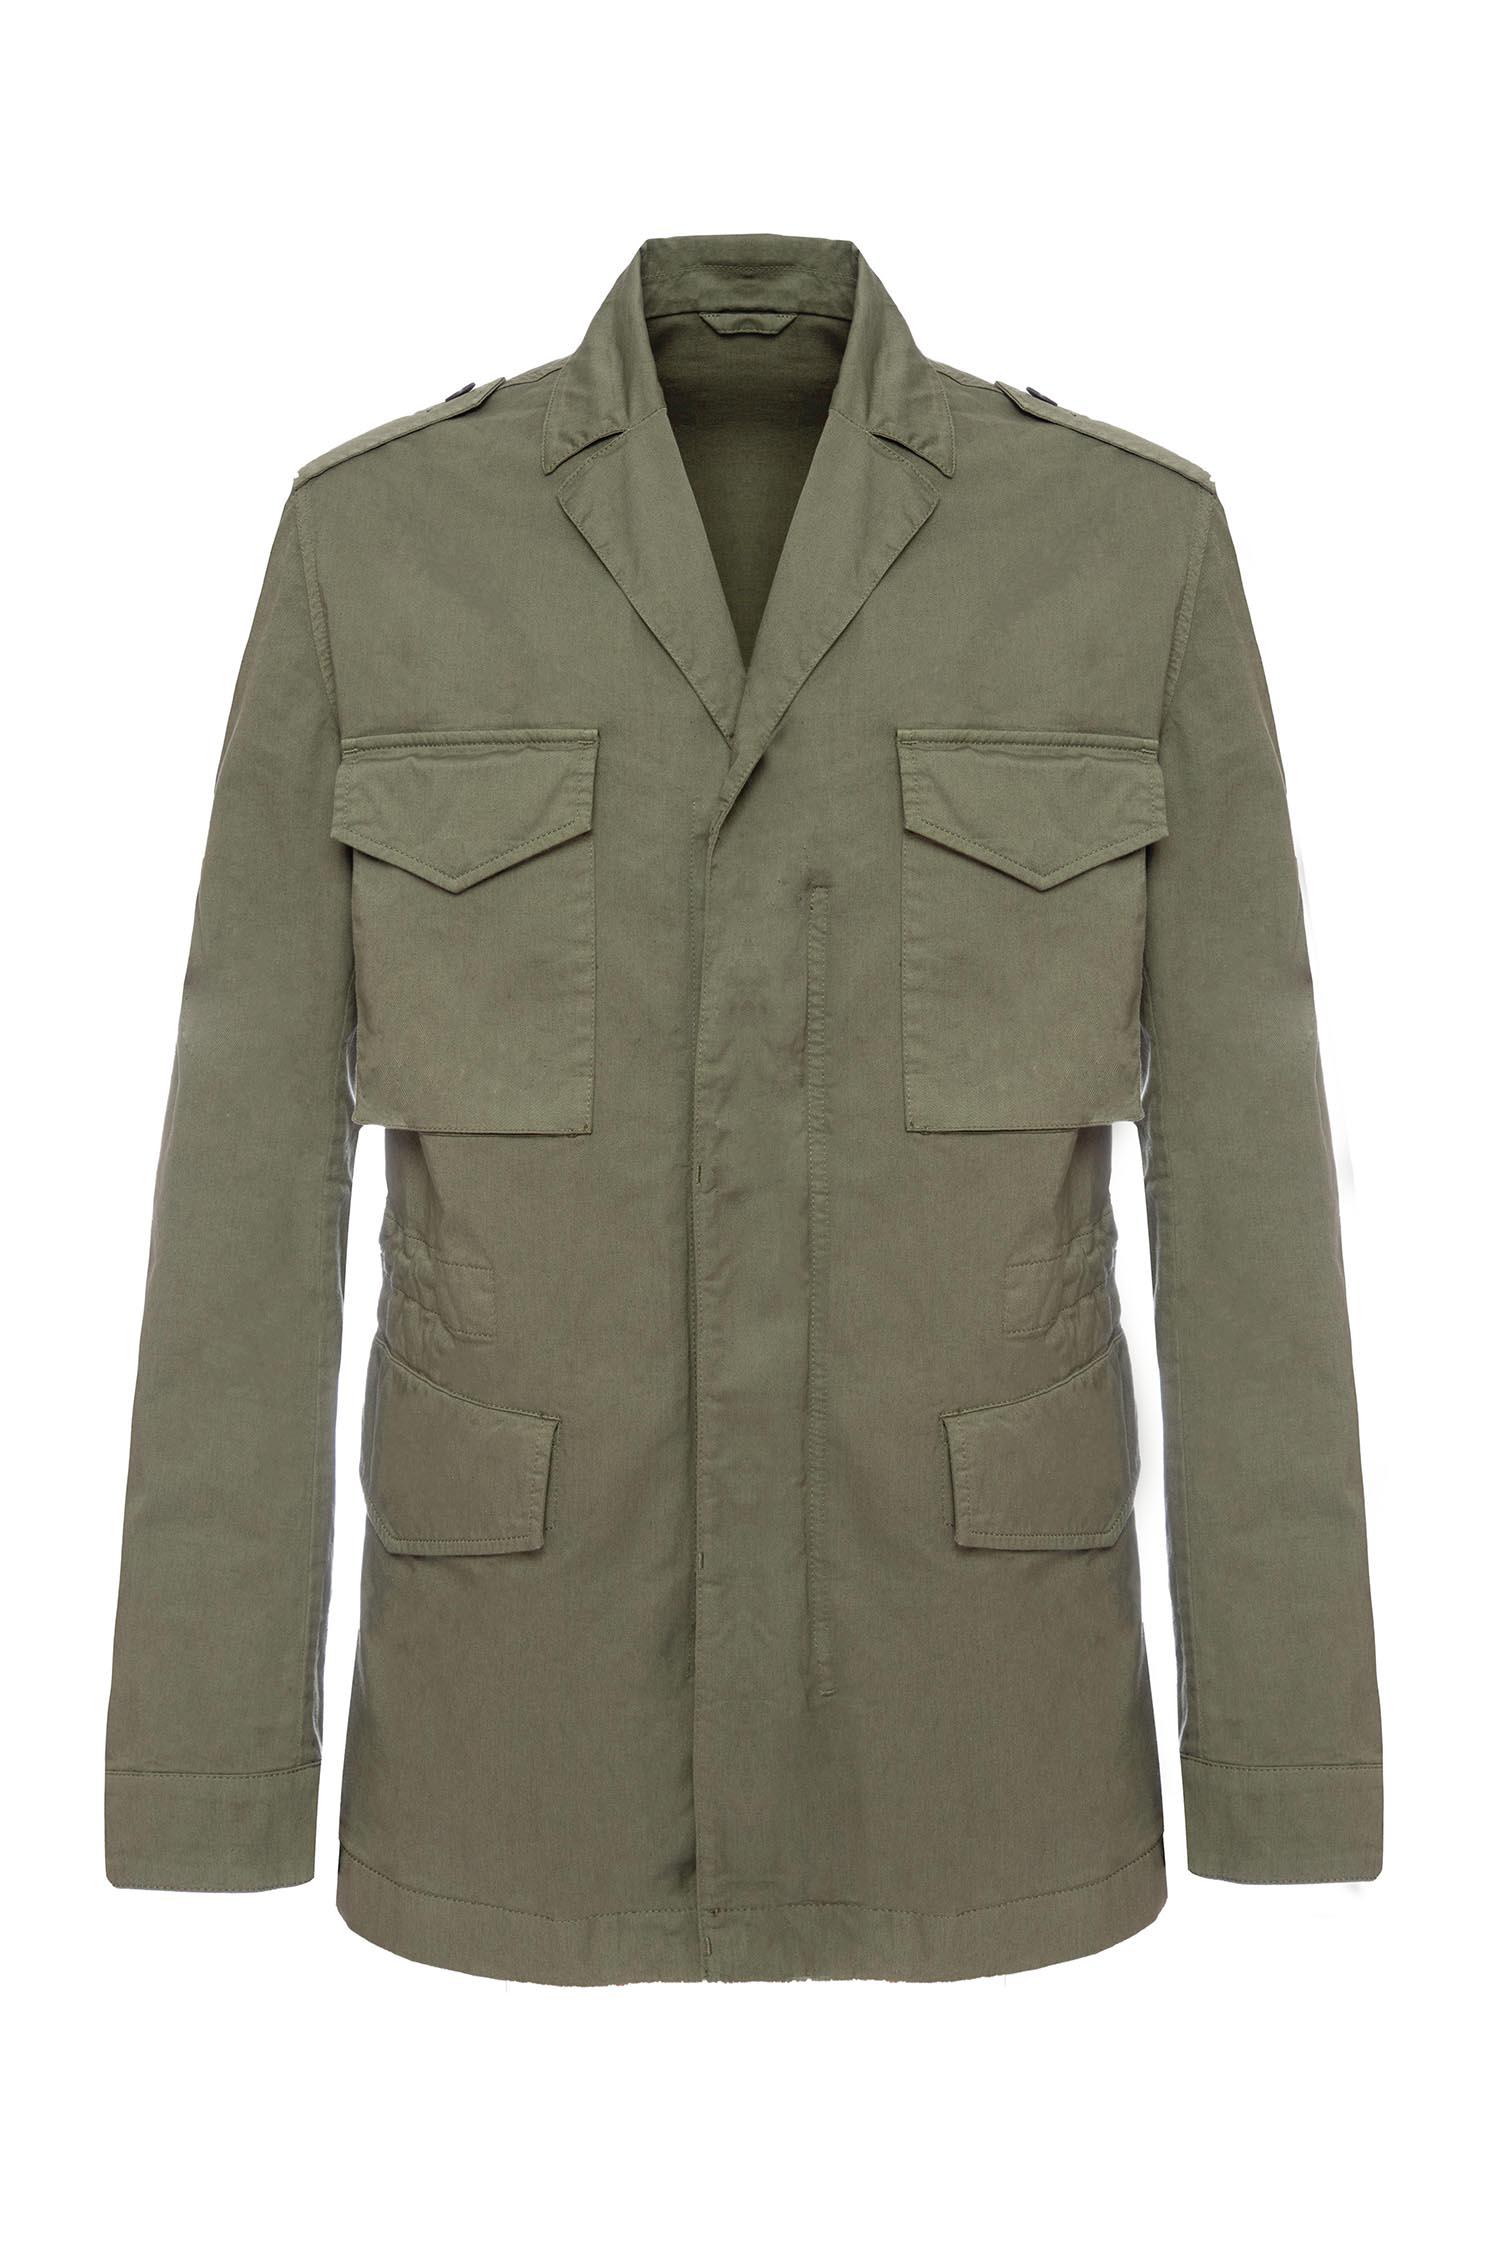 MALO_Military Jacket (1)